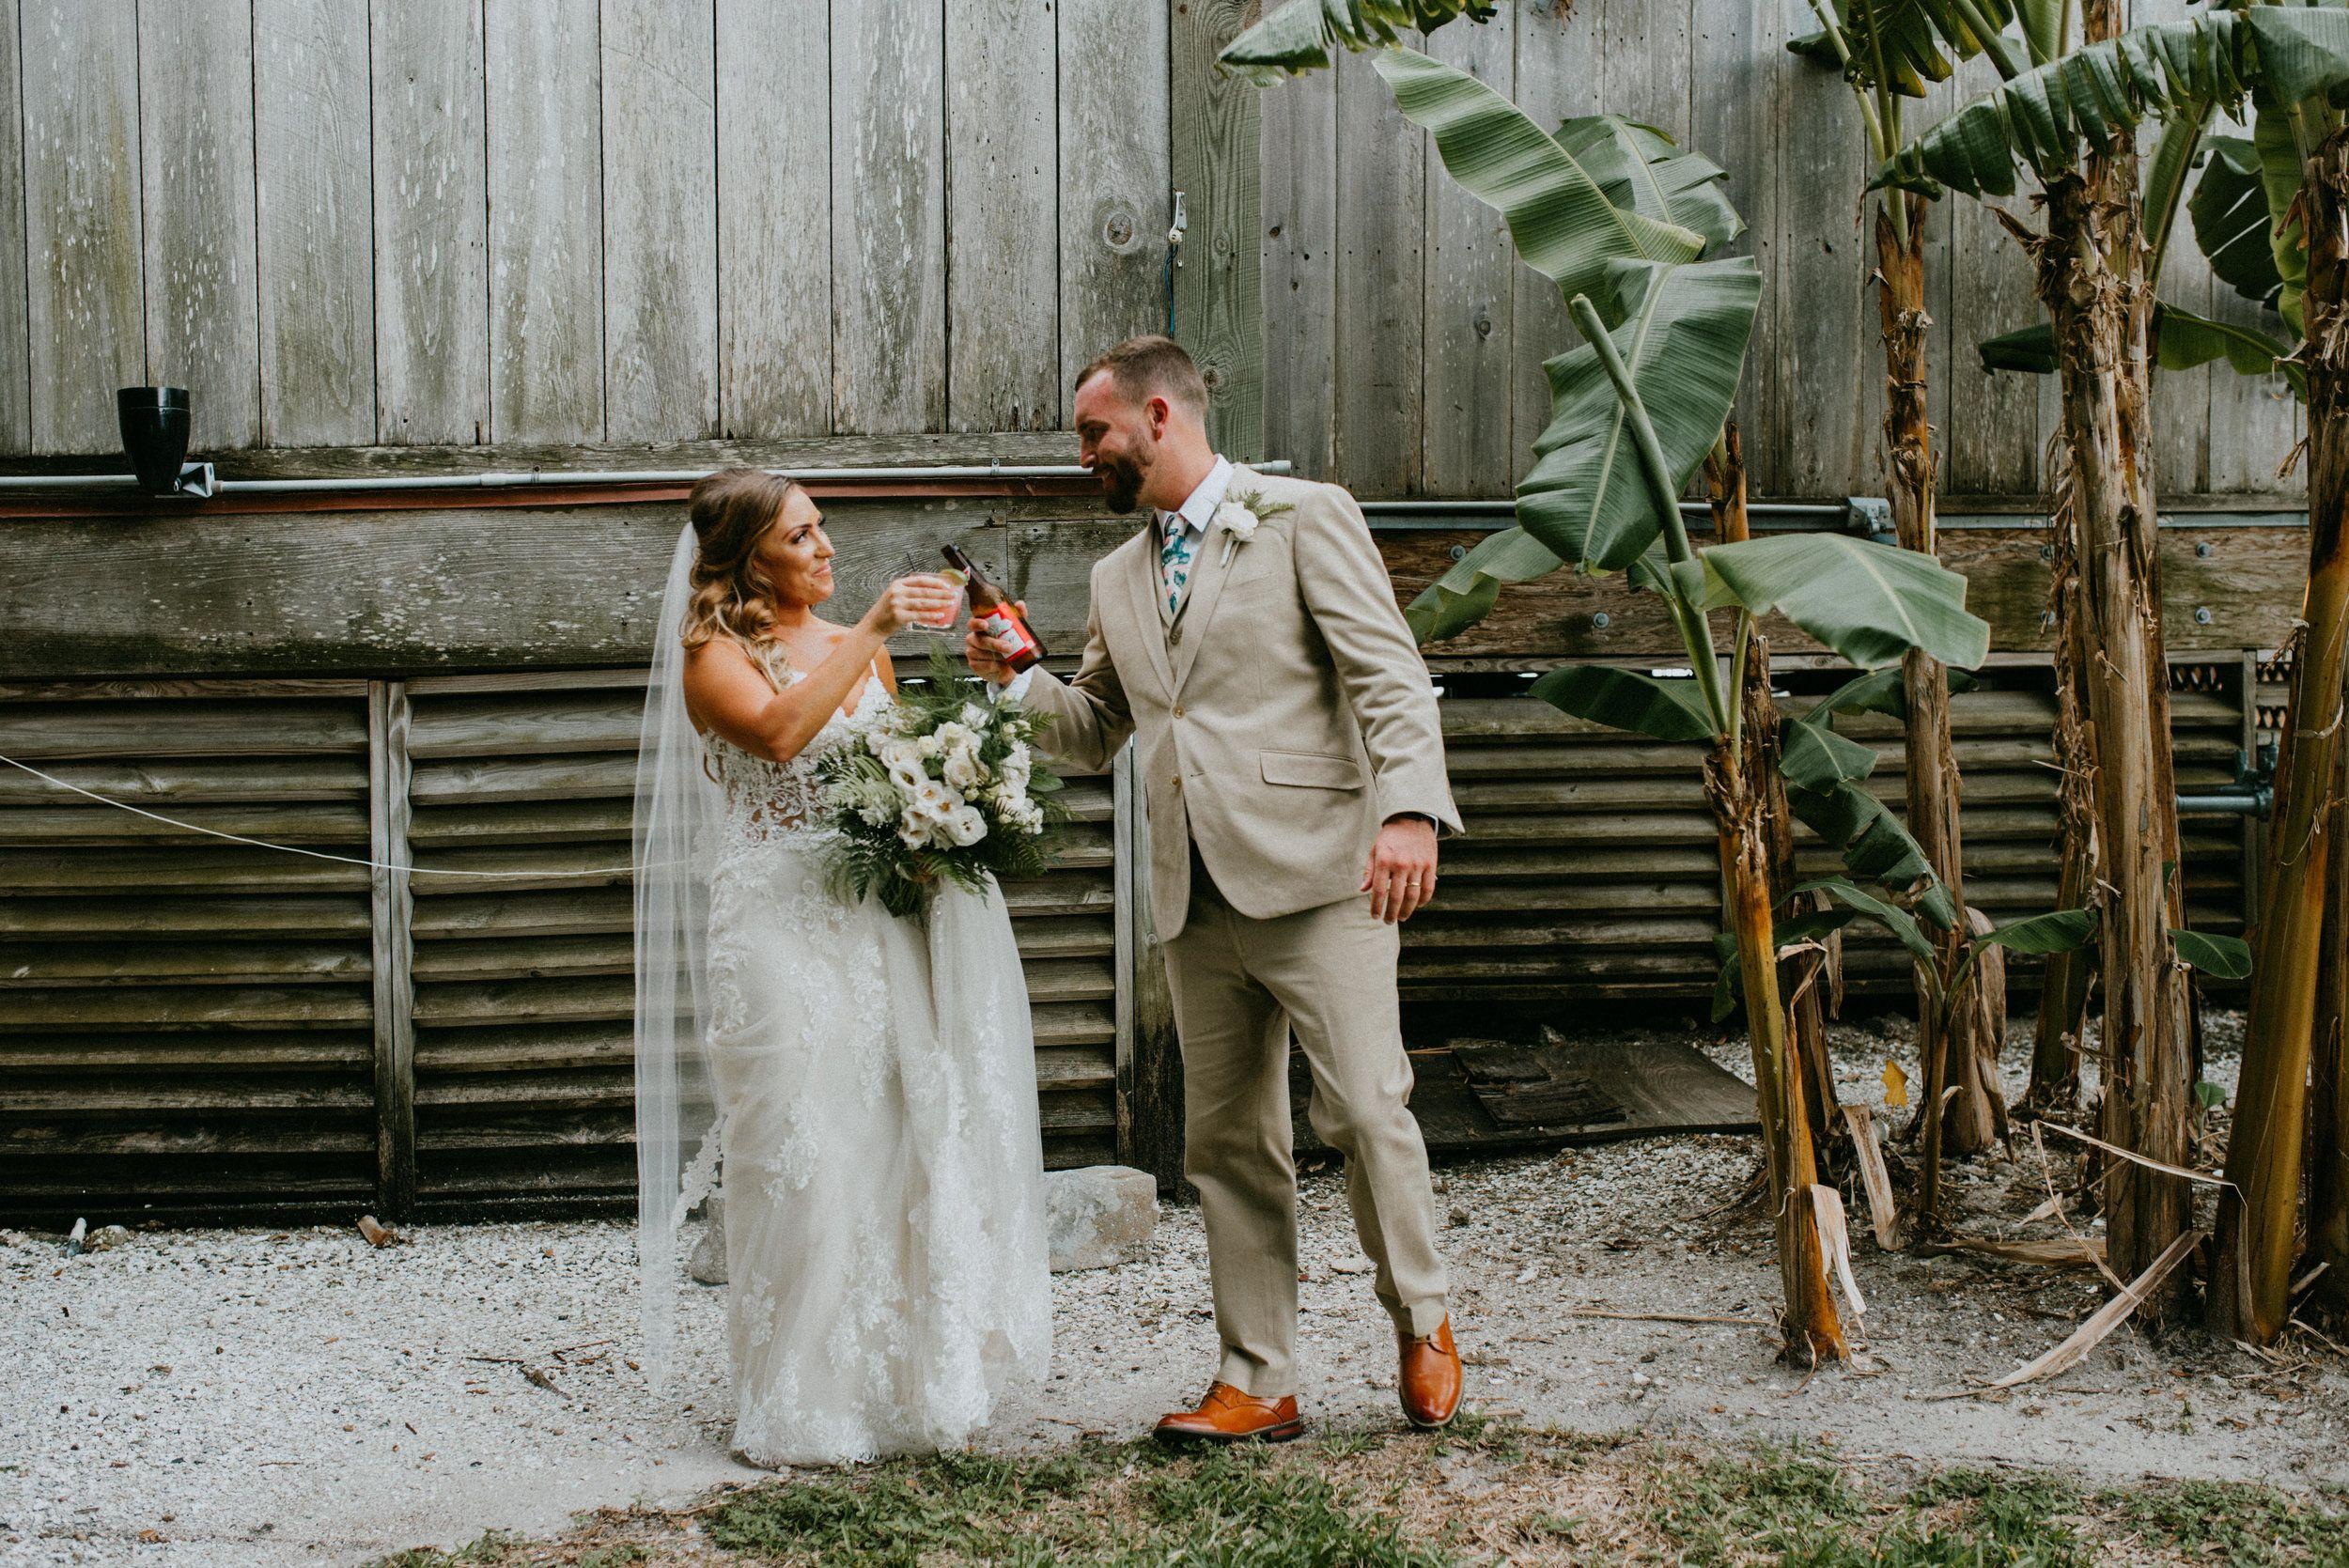 Florida Wedding Photographer Florida Wedding Photography Florida Wedding Photos Orl Florida Wedding Photographer Florida Wedding Orlando Wedding Photography